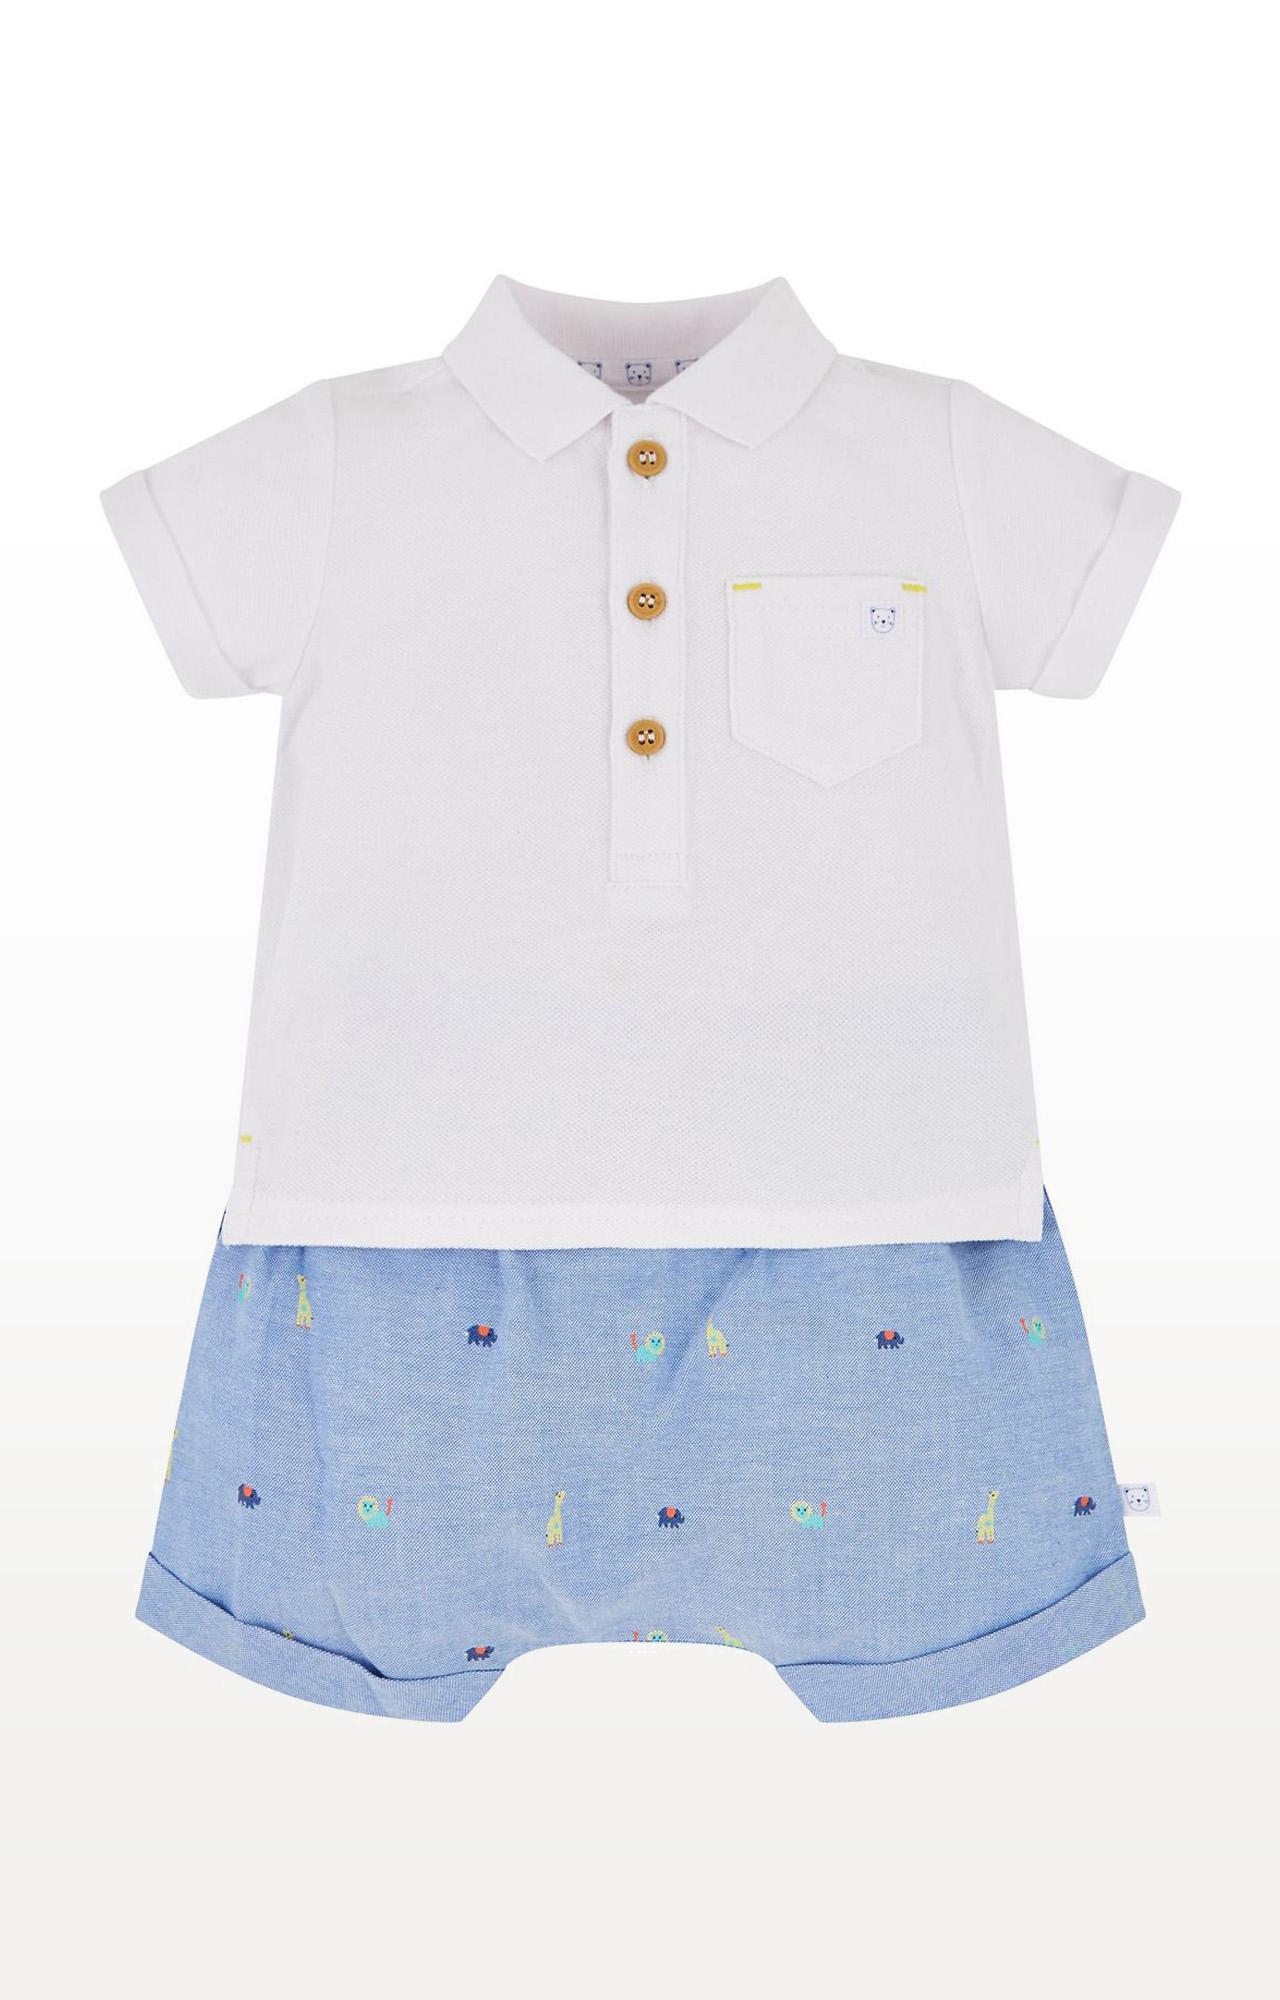 Mothercare | Denim Printed Chambray Shorts and Polo Set